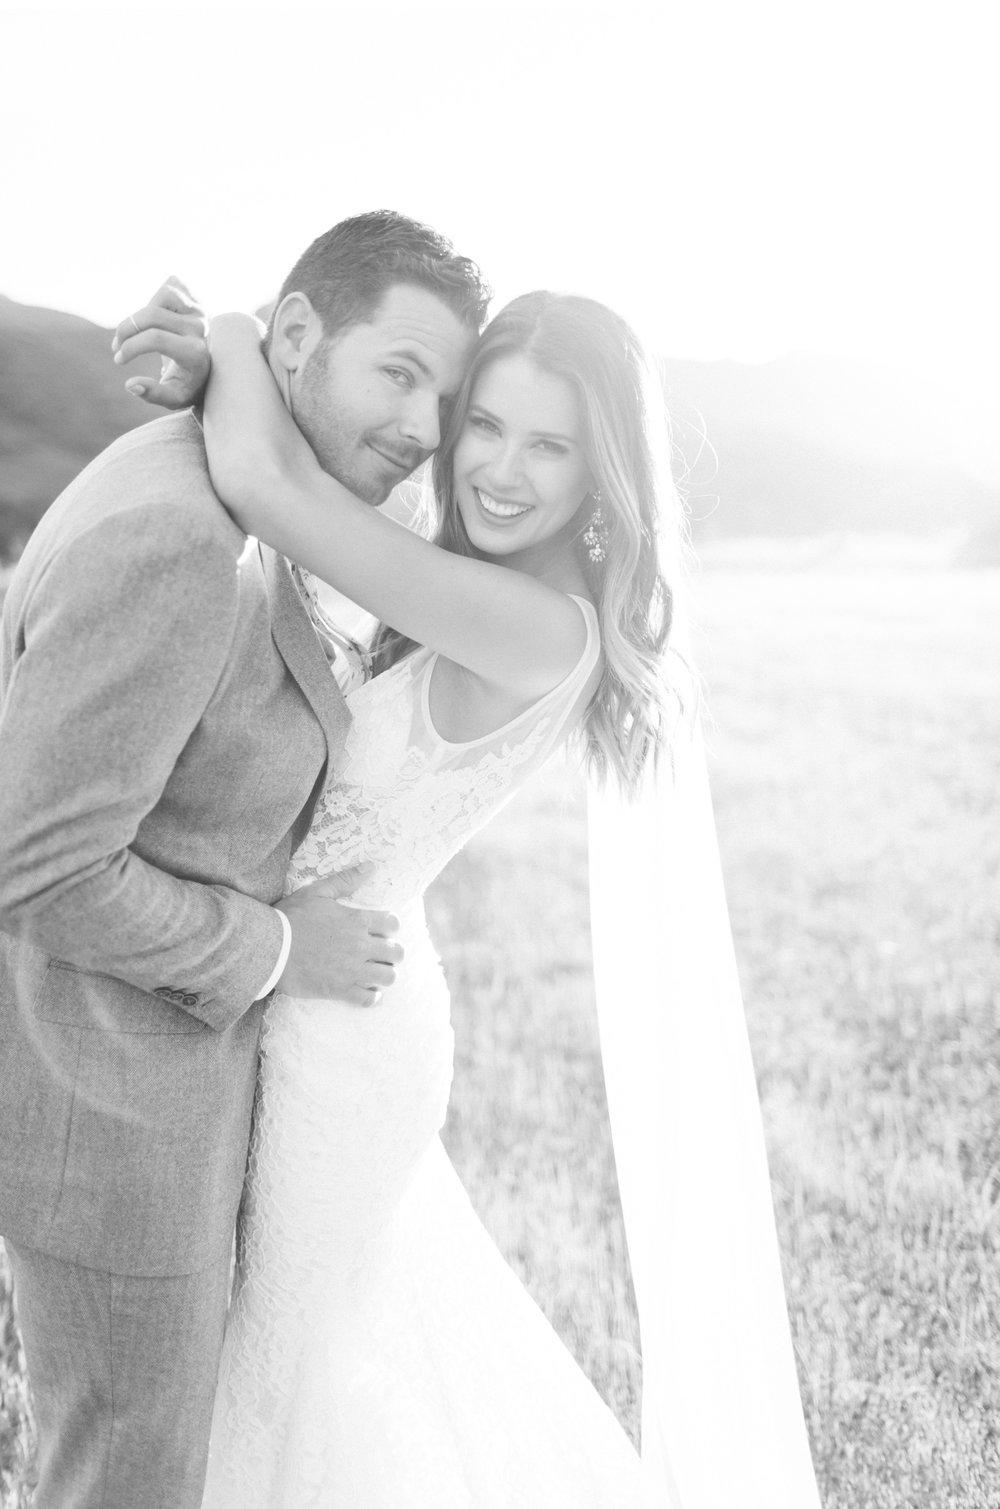 Triunfo-Creek-Malibu-Wedding-Photographer-Natalie-Schutt-Photography_20.jpg